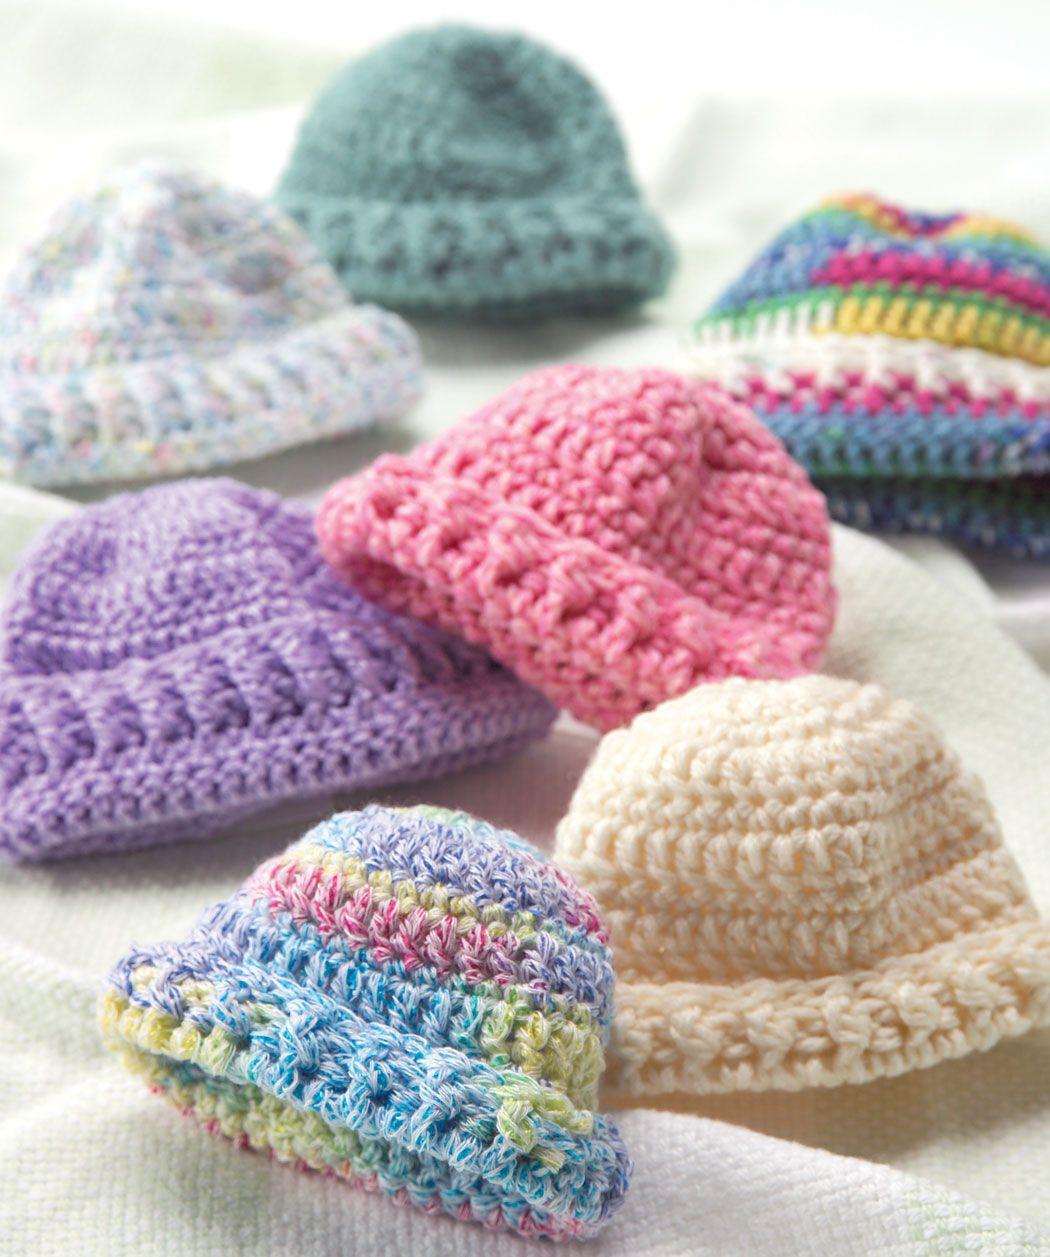 Crochet & Knit Newborn Caps free pattern | crochet | Pinterest ...